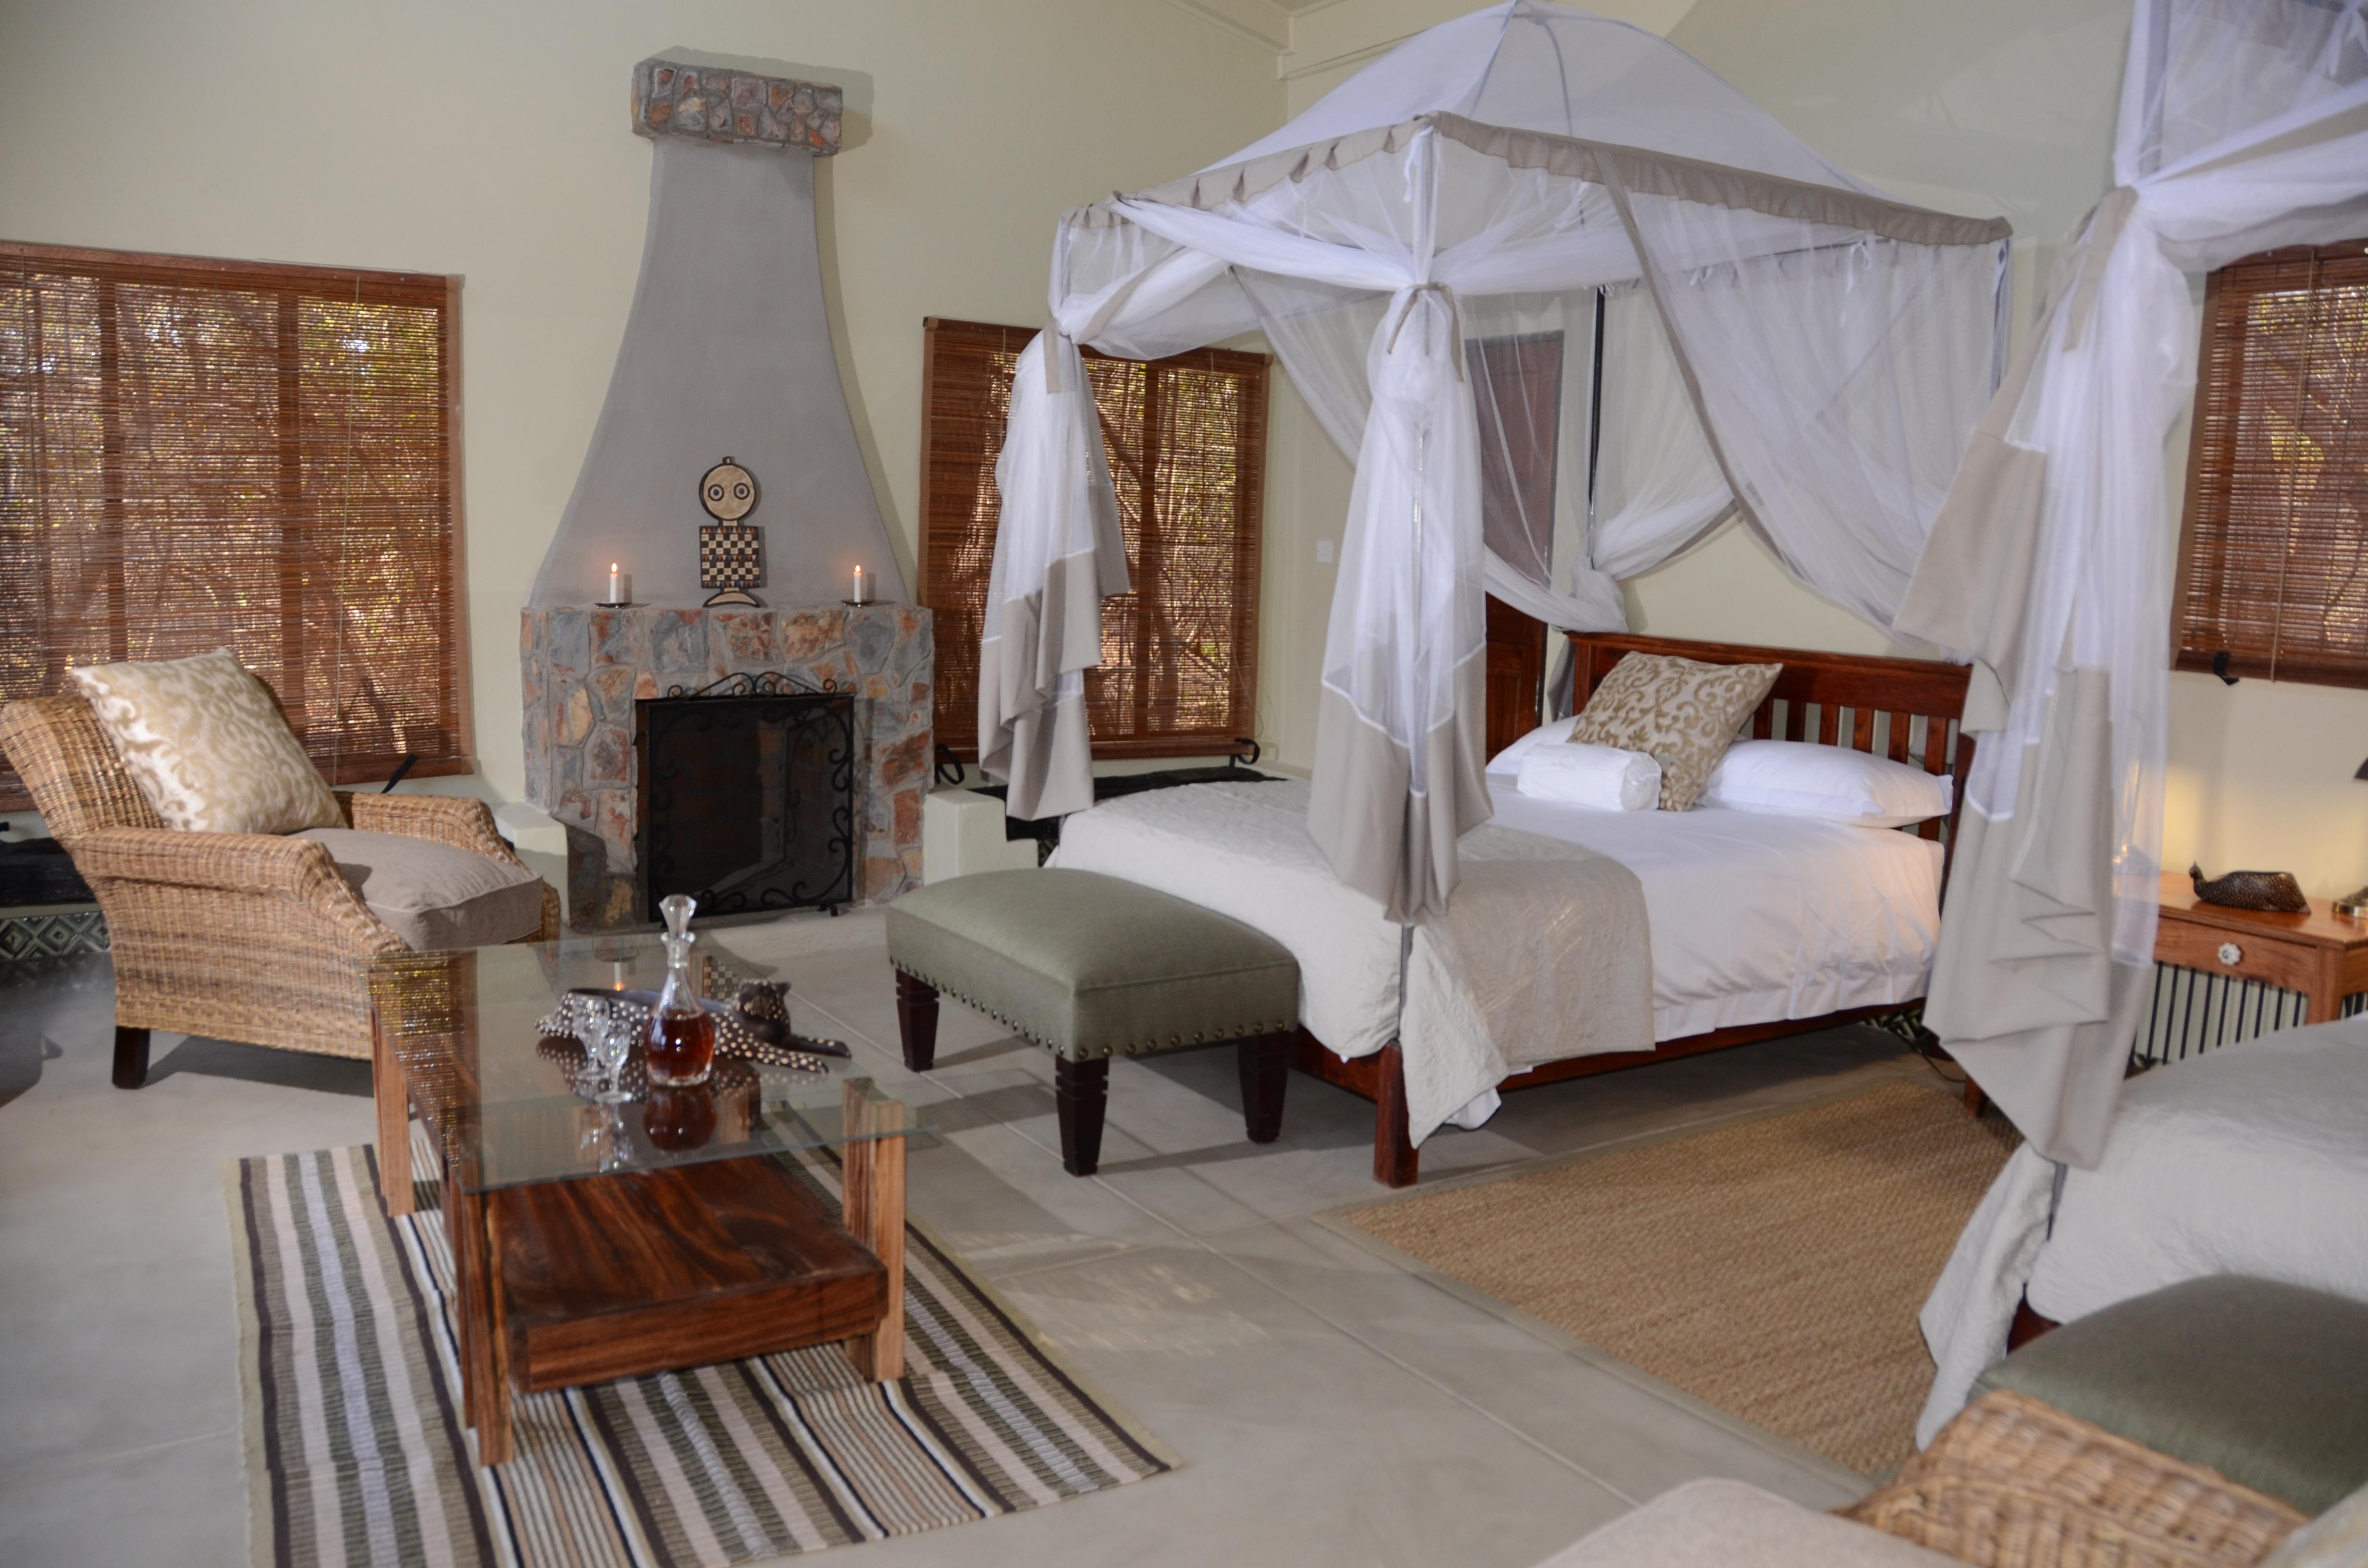 5-Camelthorn_-_Forest_Villa_twin_room_configuration.jpg